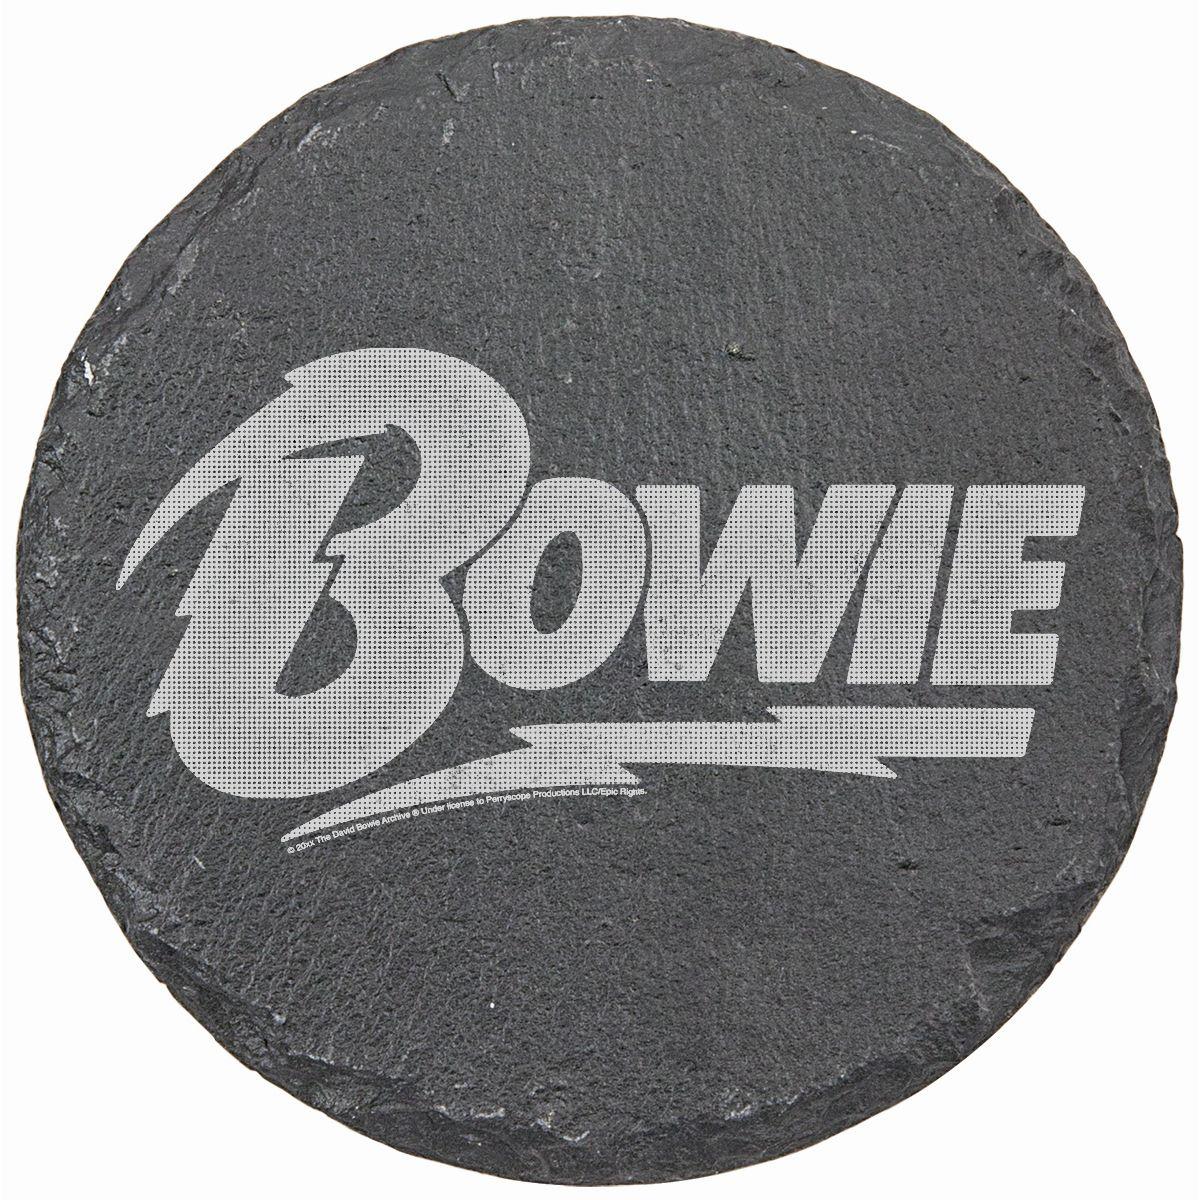 Bowie Logo Laser Engraved Round Slate Coaster (set of 4)